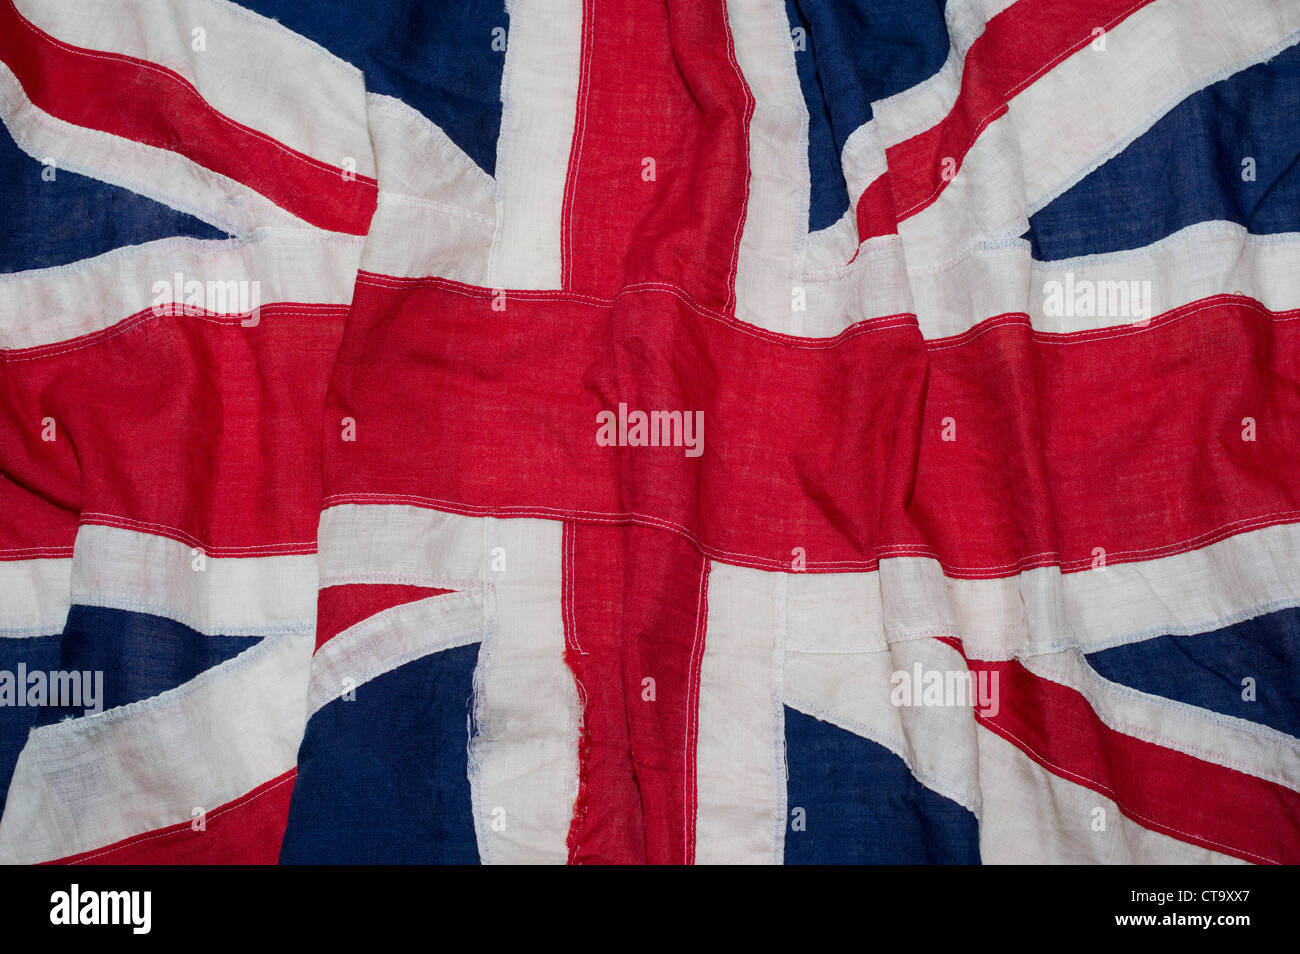 Retro Kühlschrank Union Jack : Union jack flag vintage stockfotos union jack flag vintage